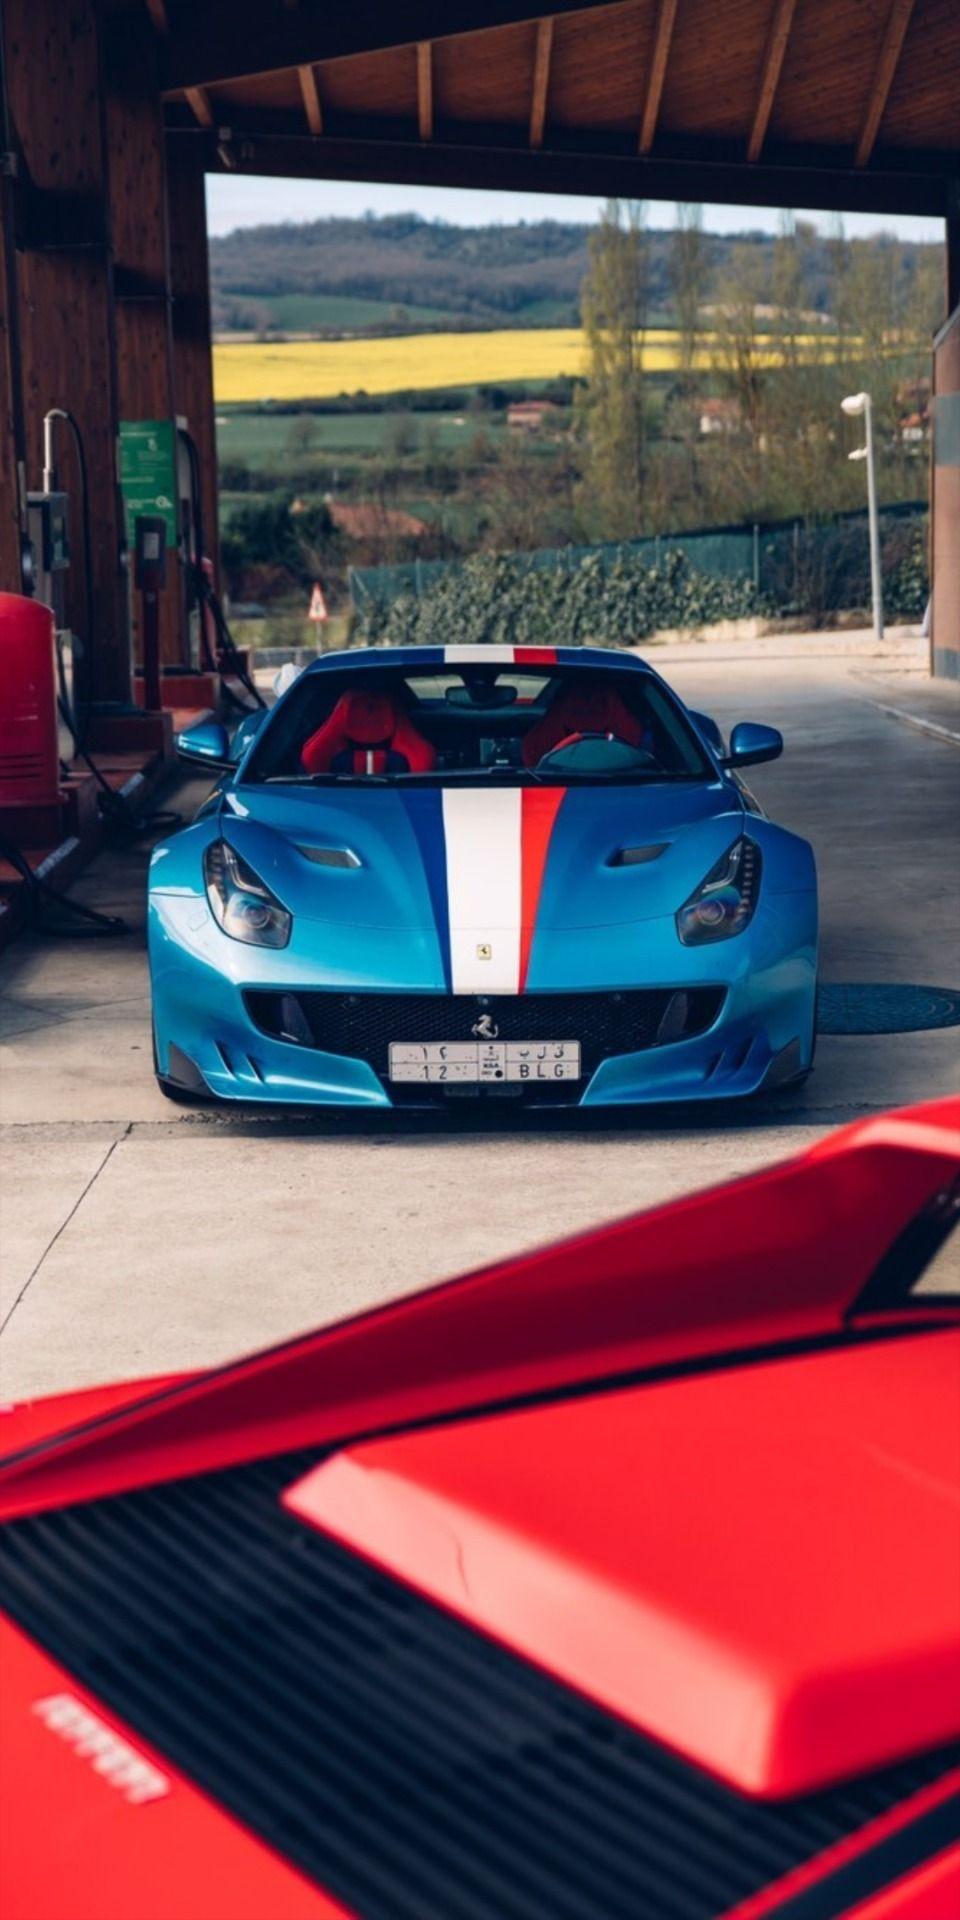 Ferrari F12 Tdf With French Livery Doing A Staredown Ferrari F12